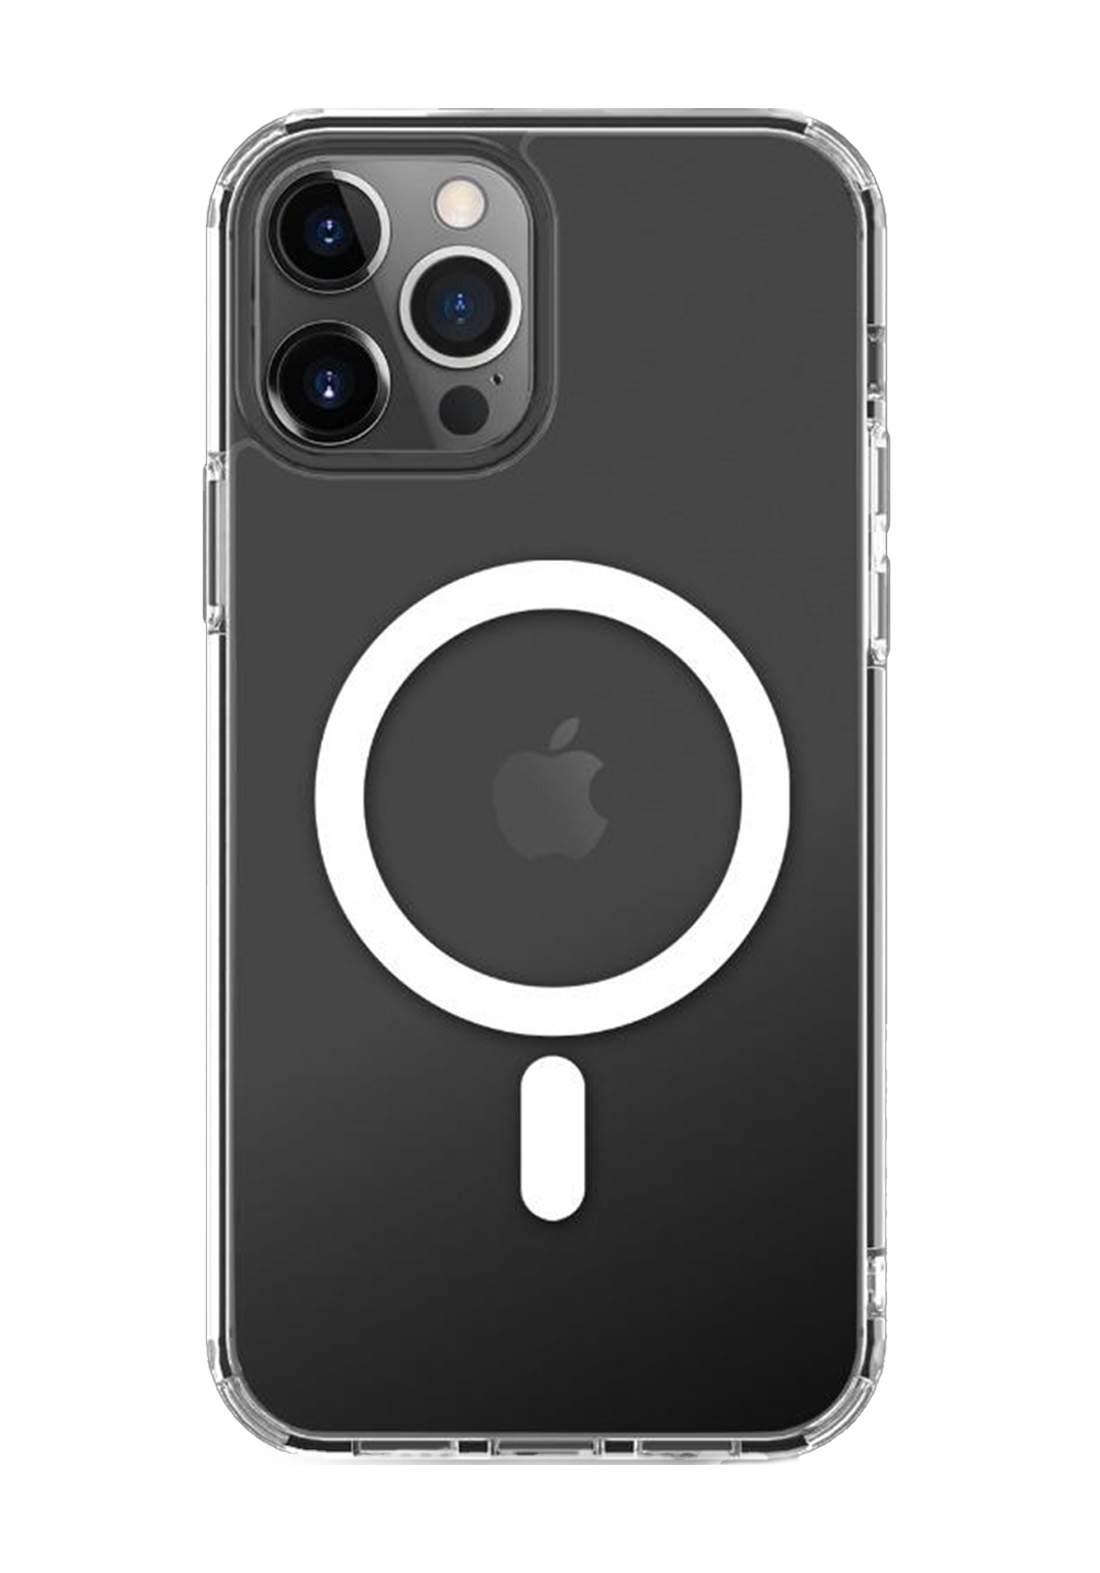 Viva Madrid VanGuard Halo Clear Case for iPhone 12 Pro Max حافظة موبايل